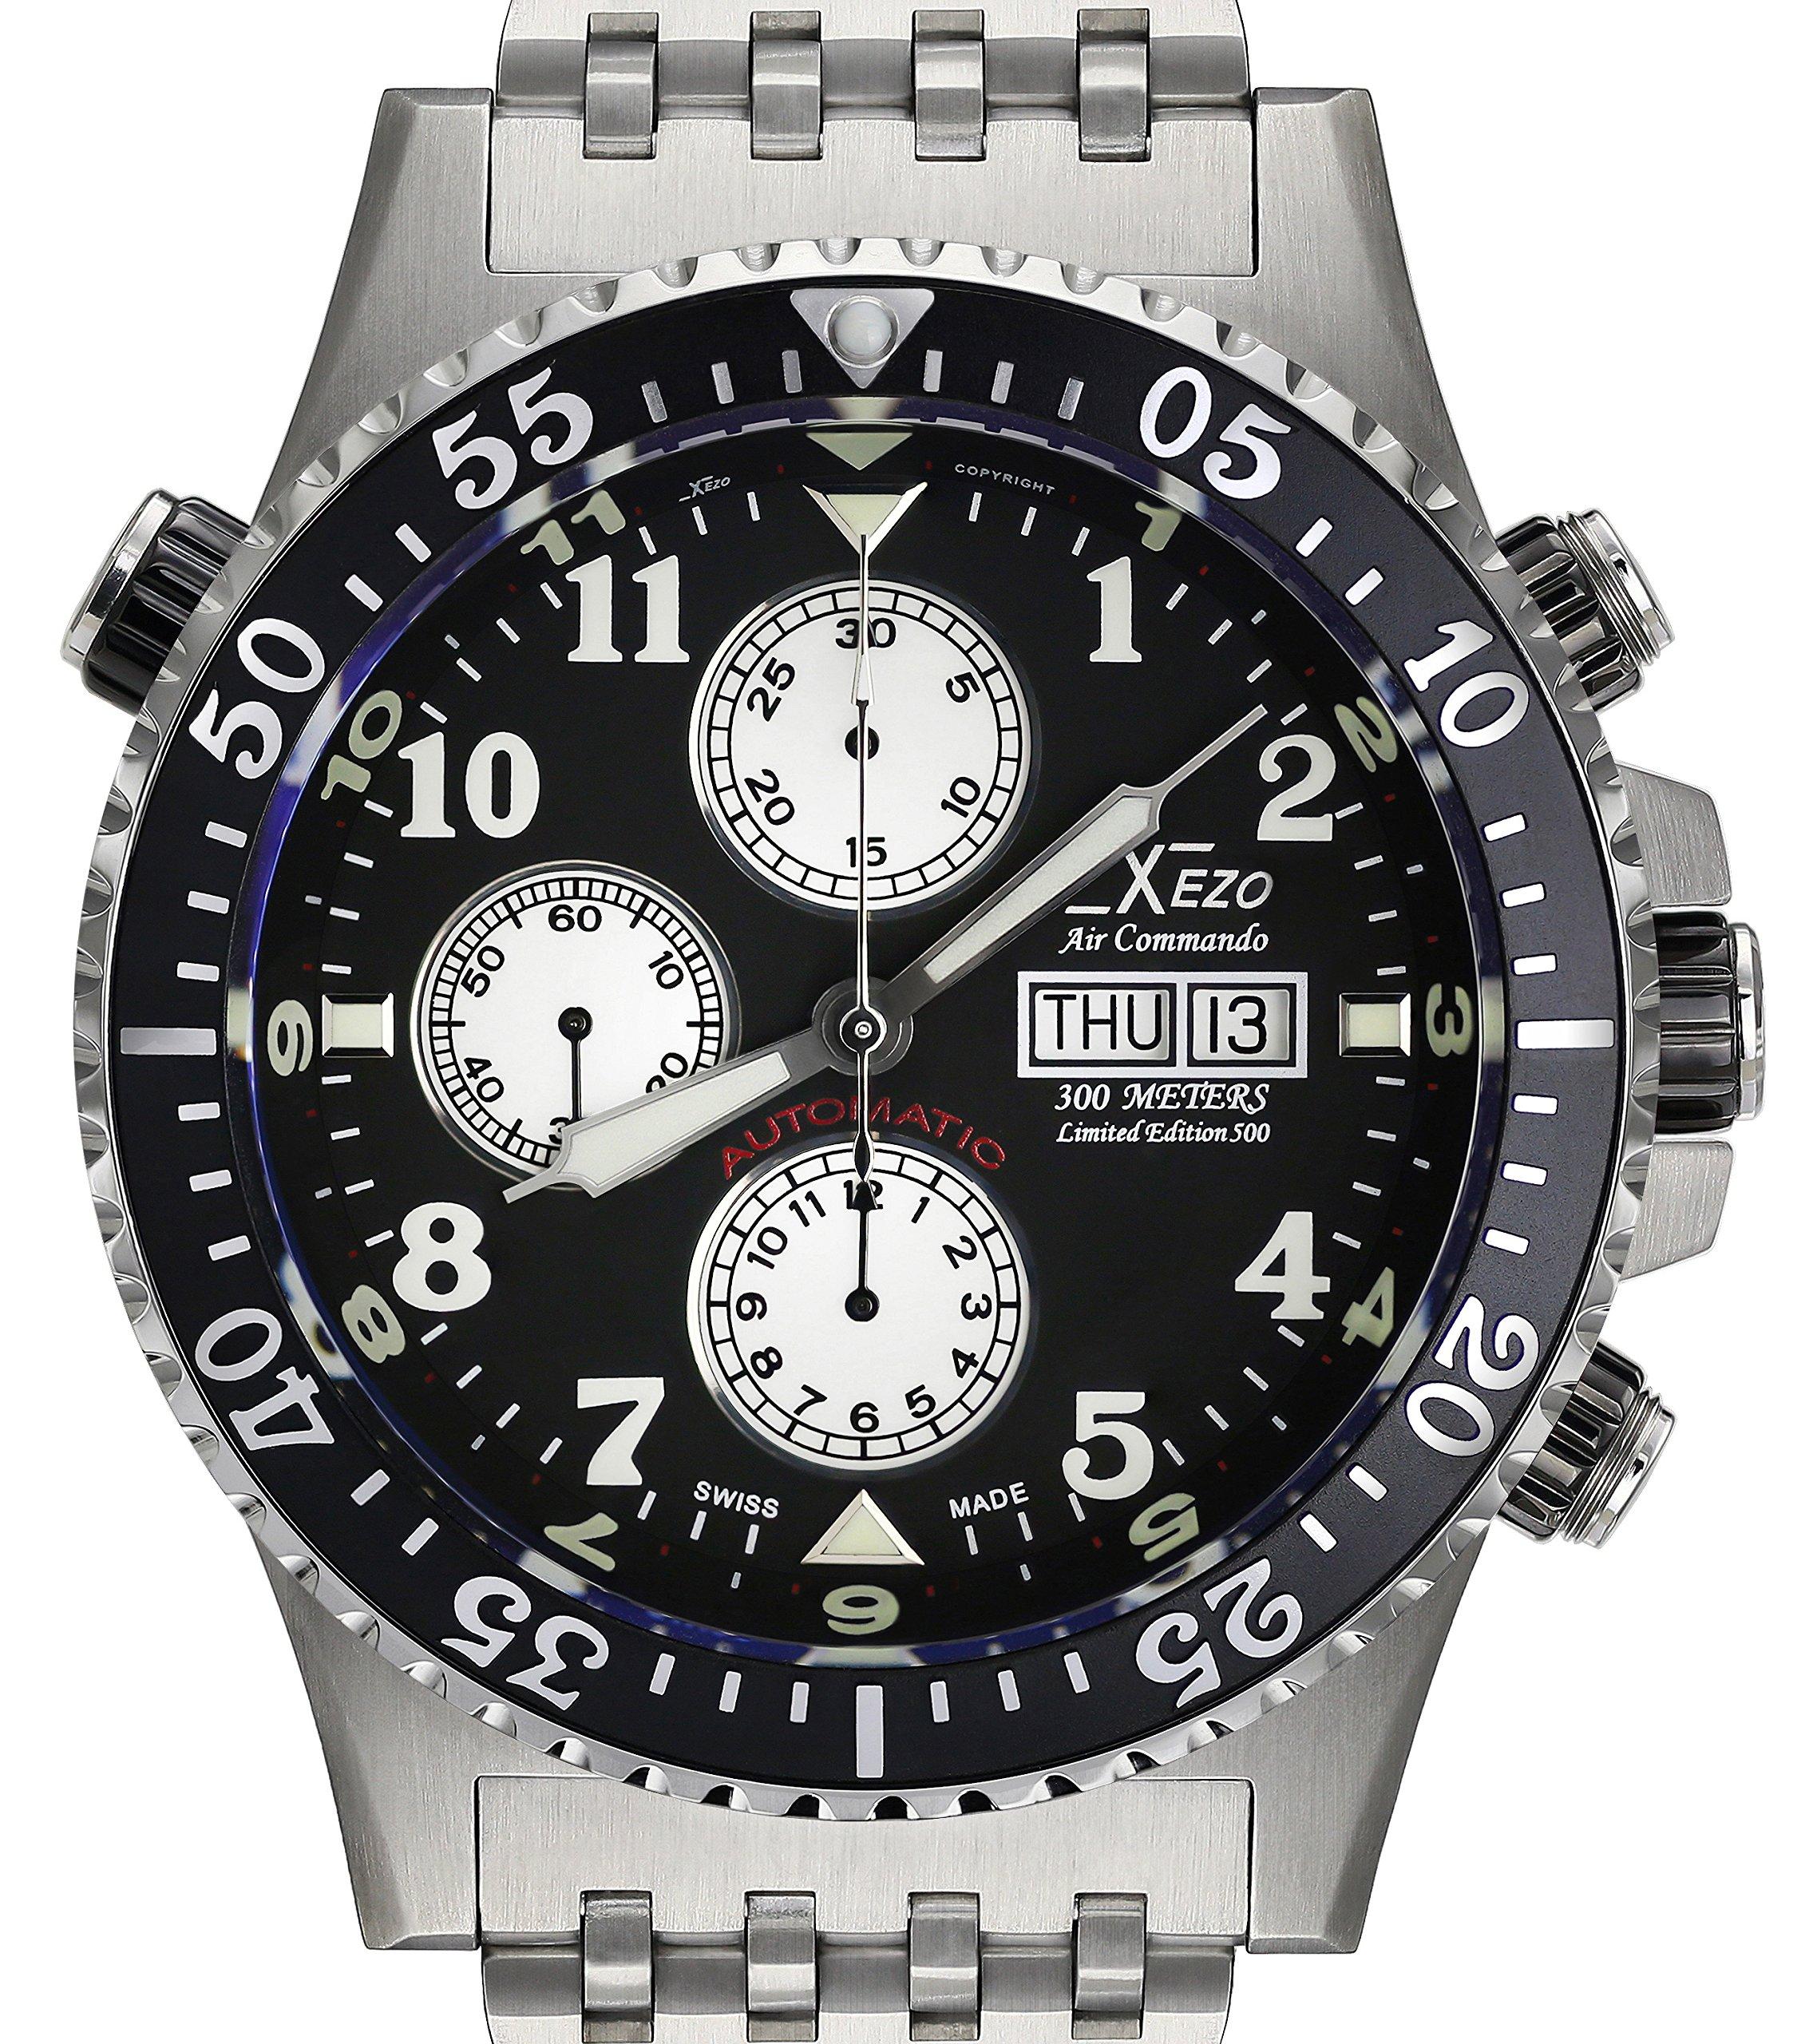 Xezo Men's Air Commando Diver Pilot Swiss Automatic Valjoux 7750 Luxury Chronograph Waterproof Wrist Watch. 2 Time Zones